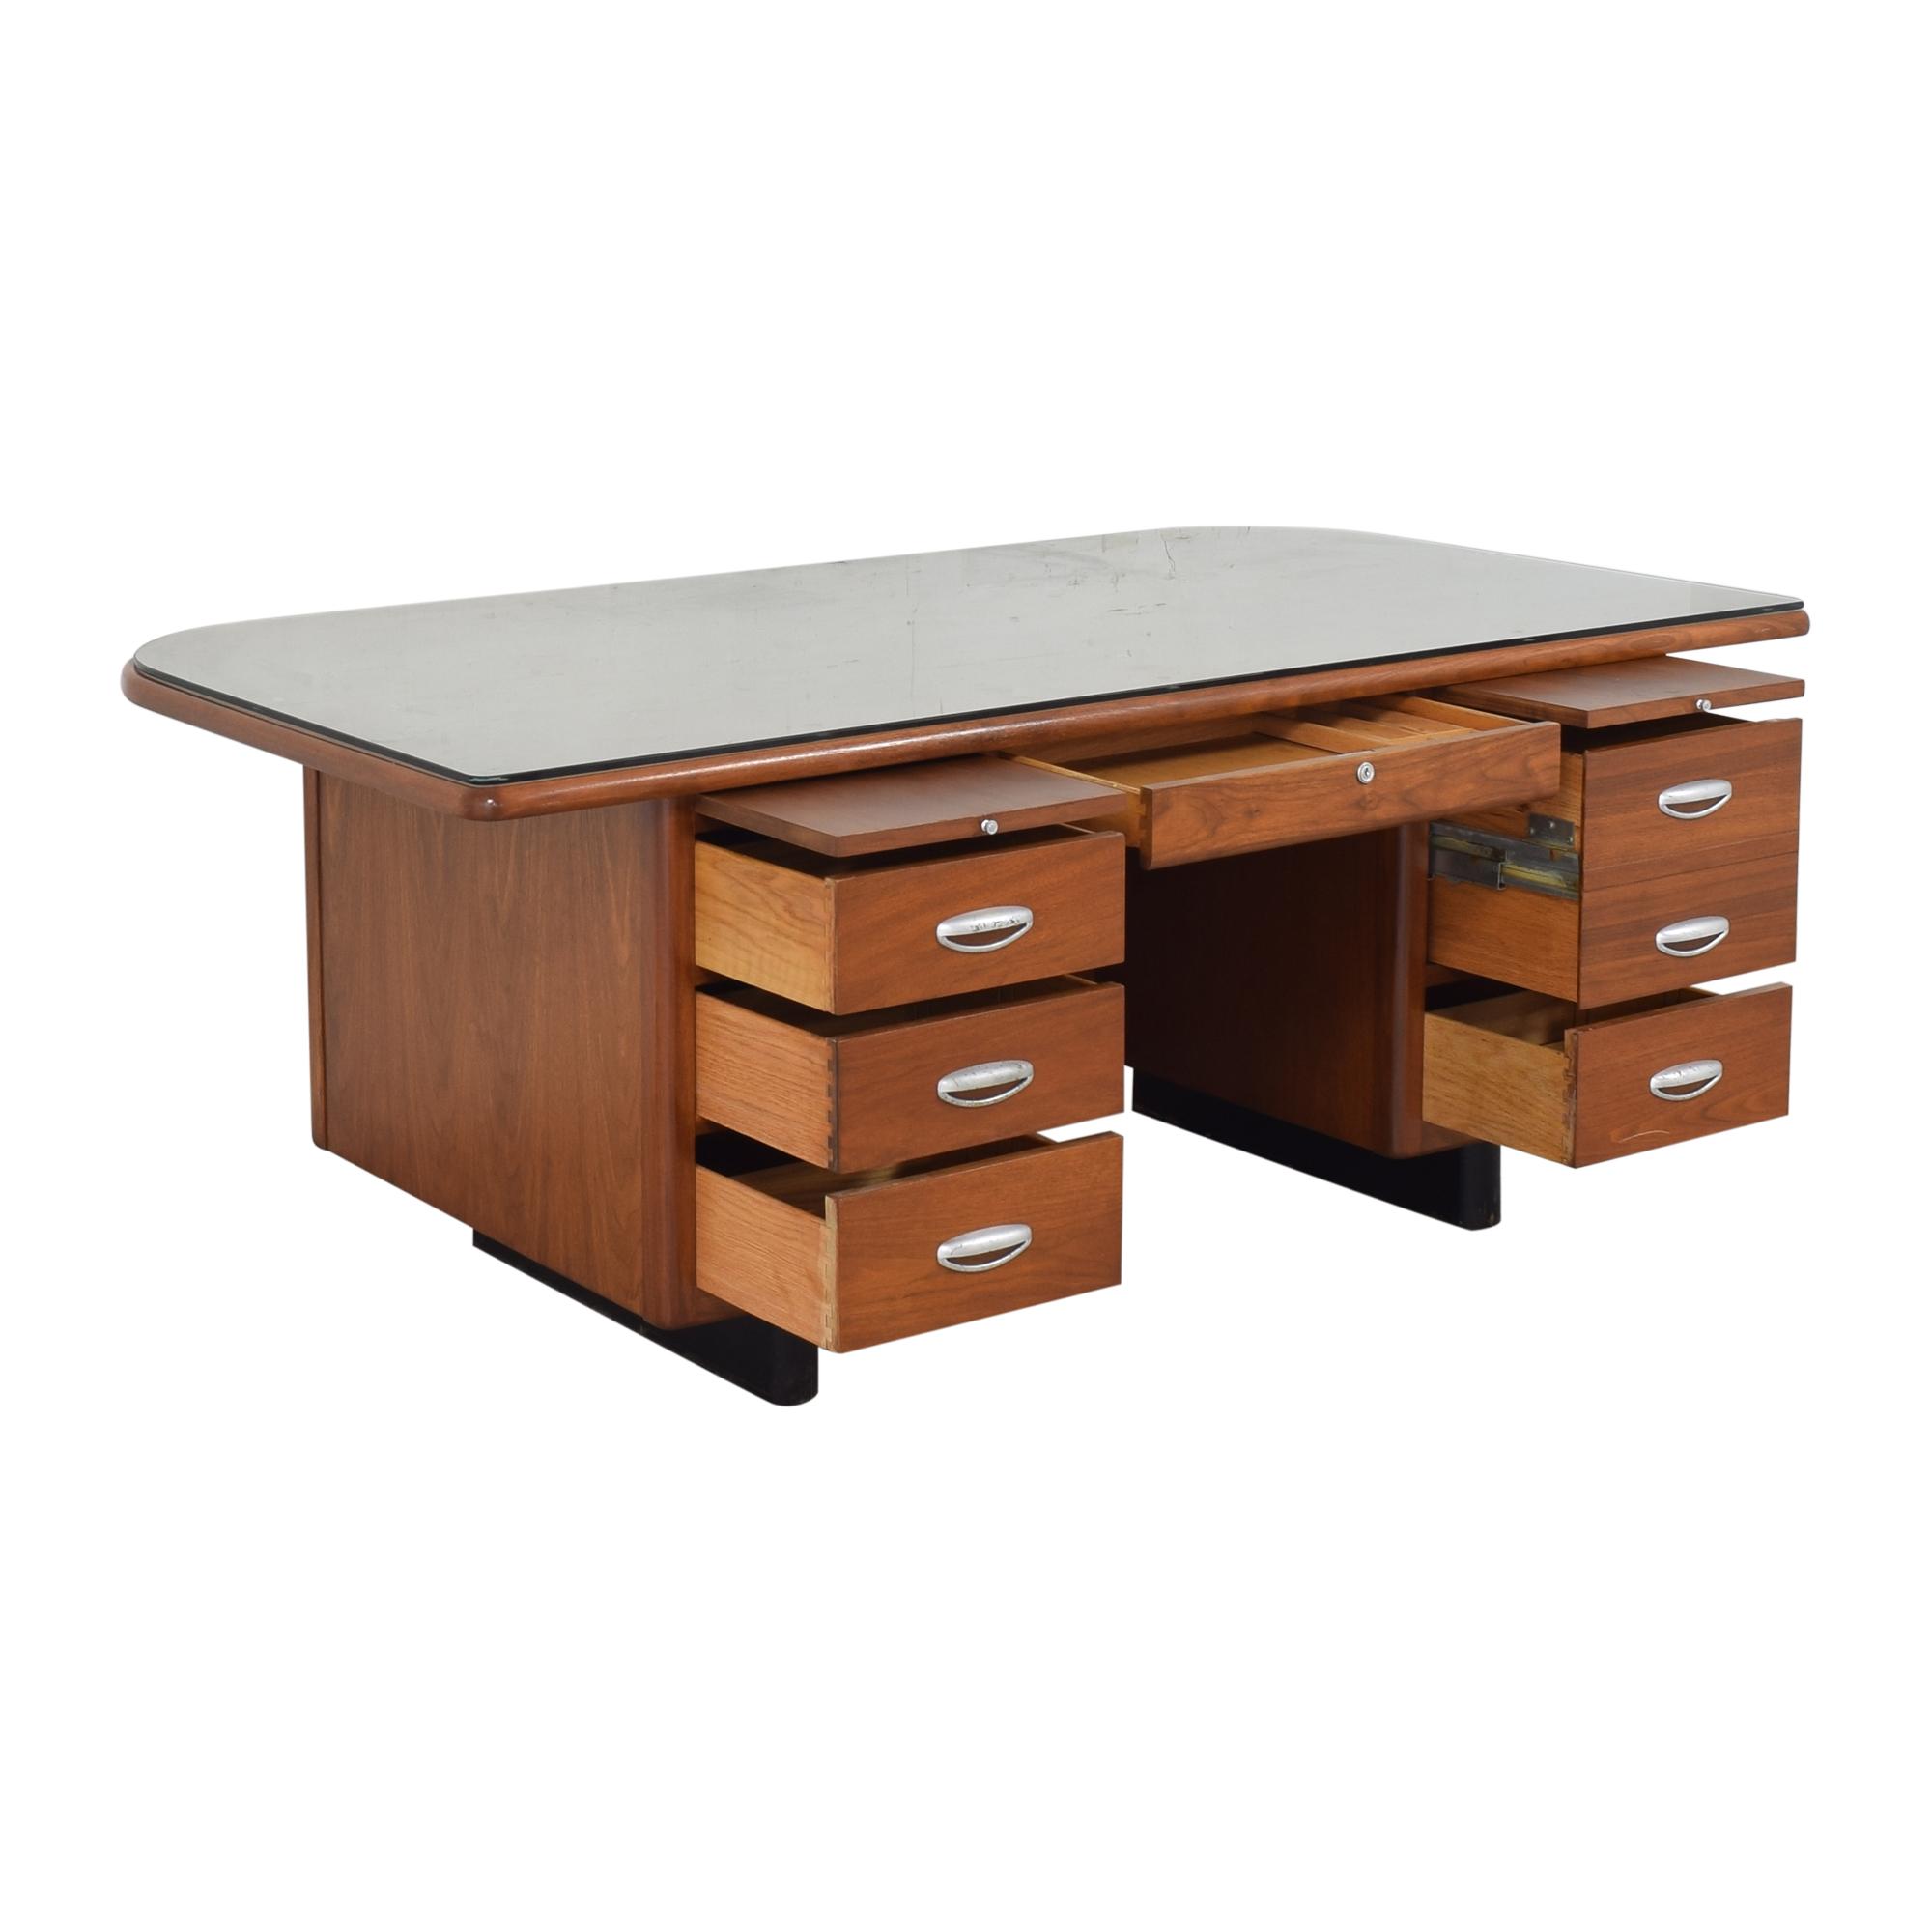 Hoosier Desk Co. Hoosier Desk Co. Vintage Executive Desk dimensions